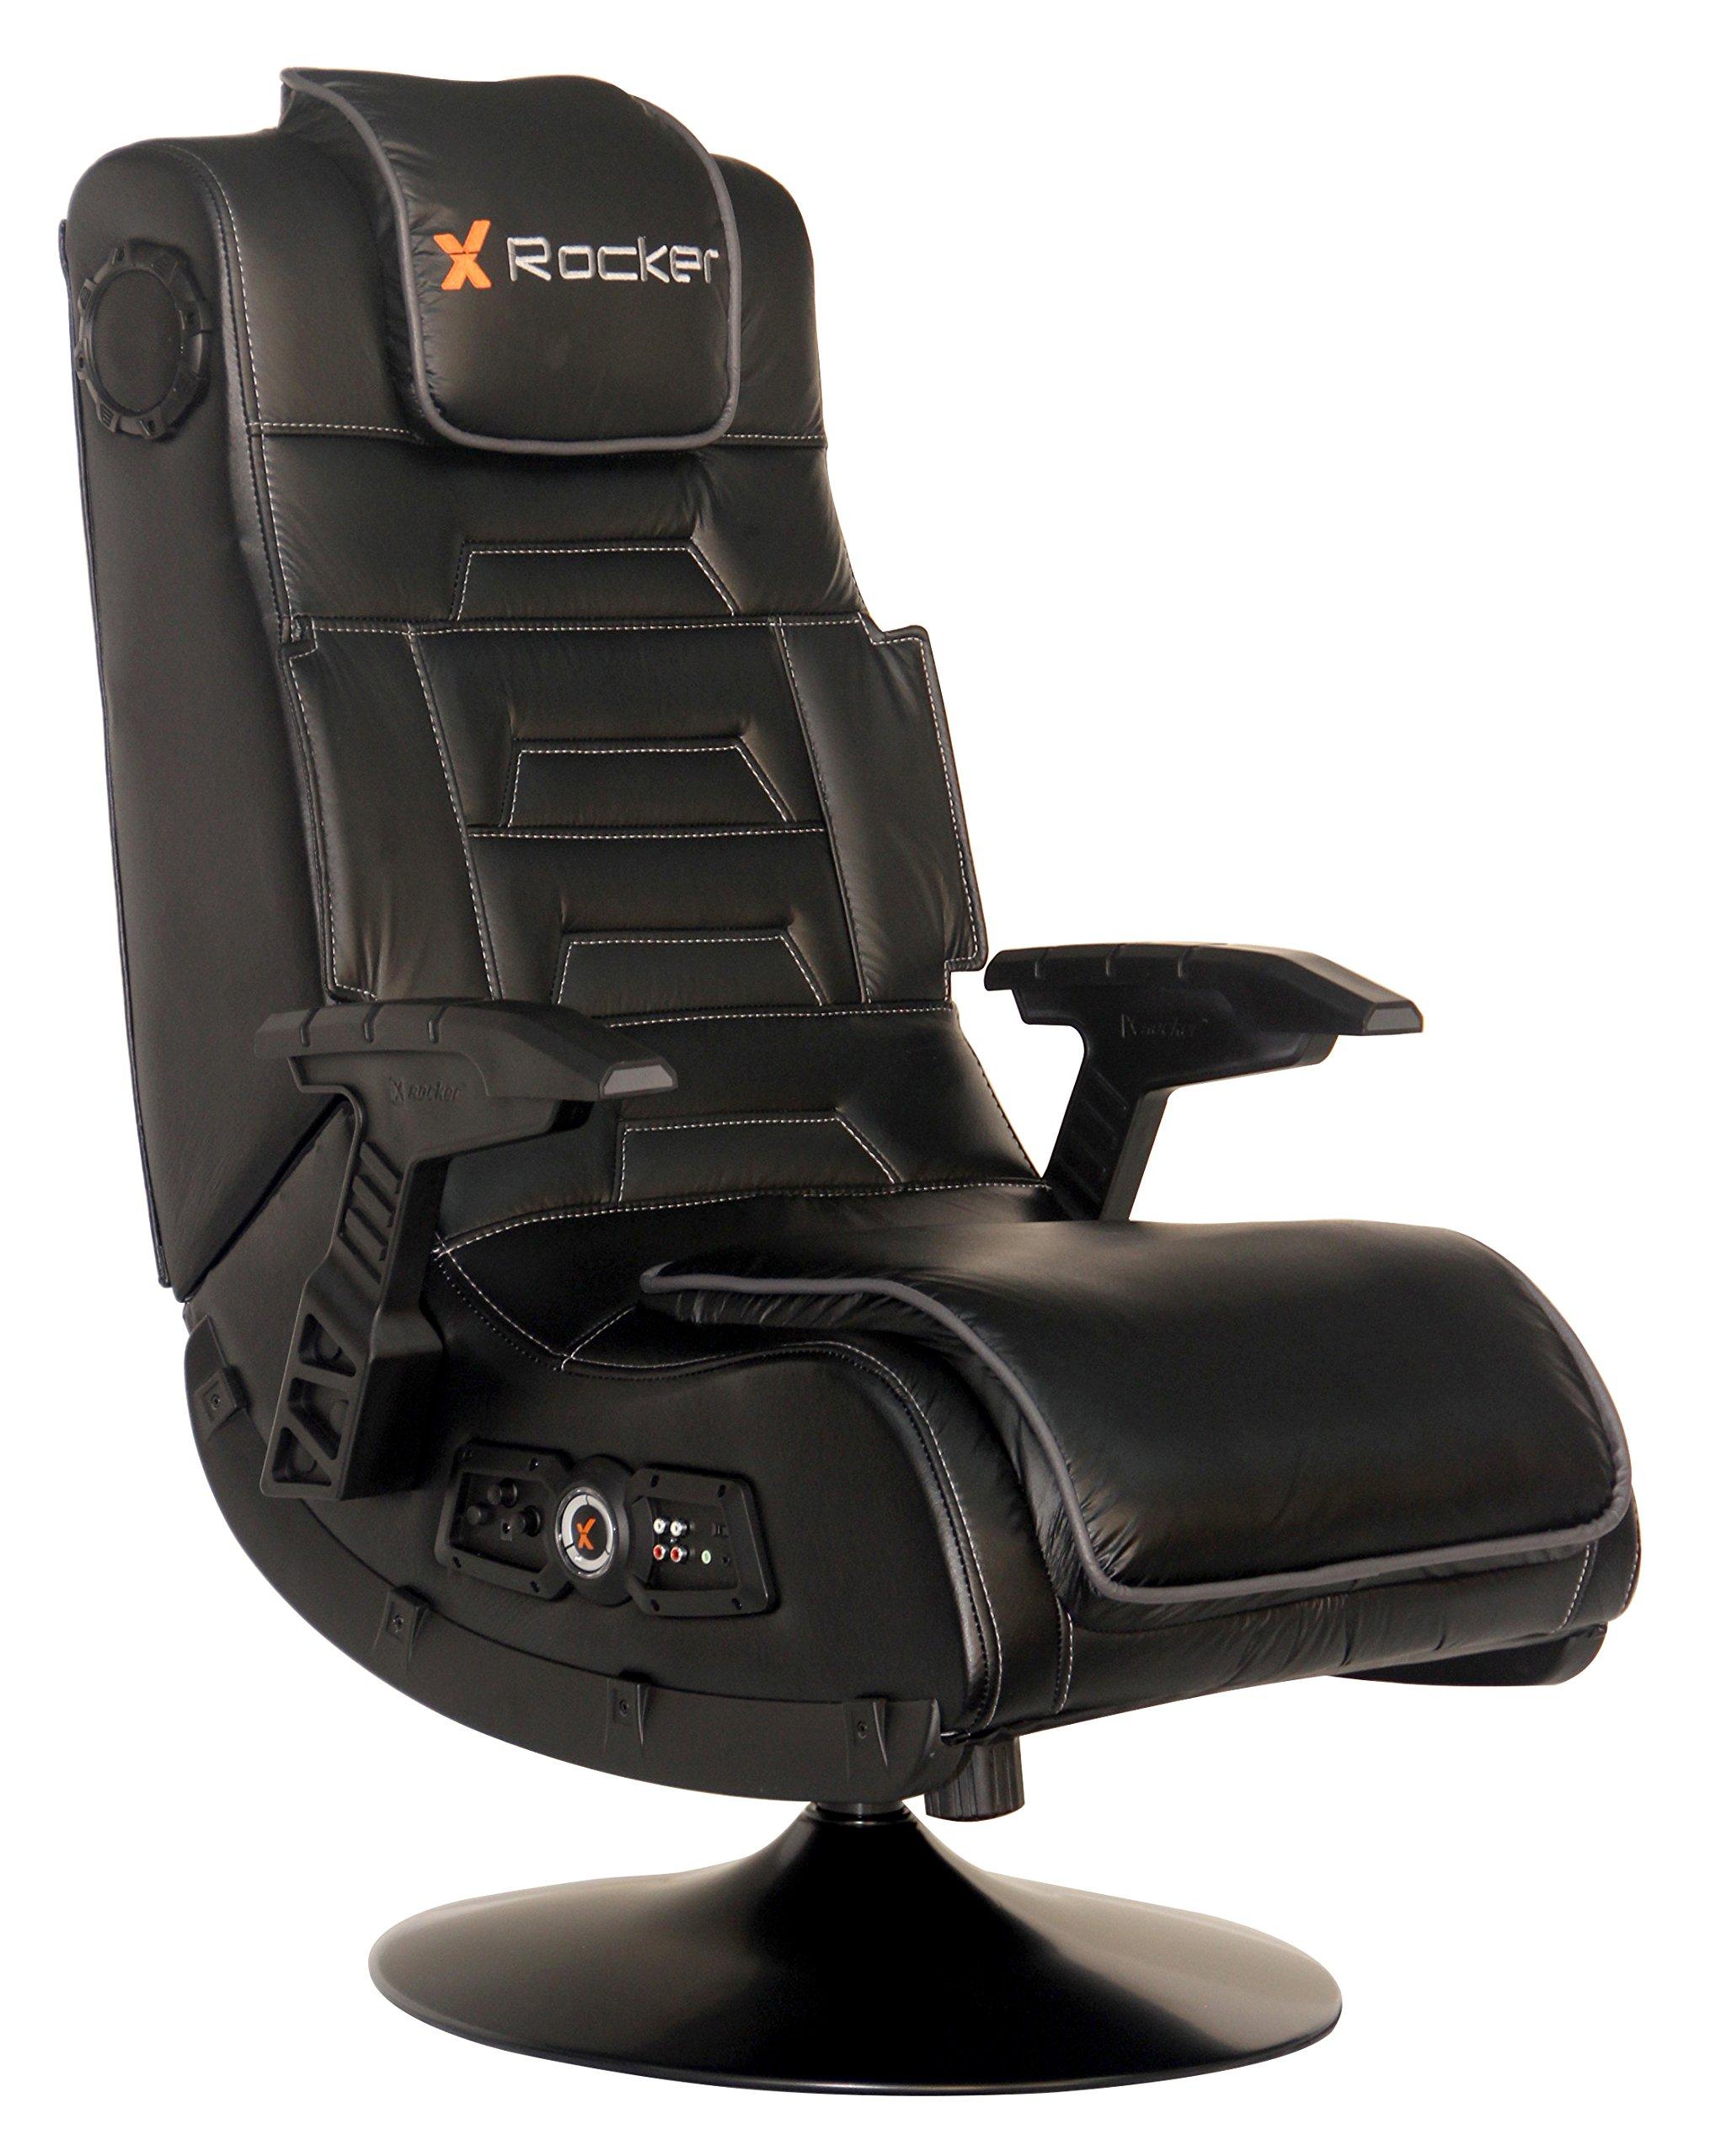 X Rocker 51396 Pro Series Pedestal 2.1 Video Gaming Chair, Wireless by X Rocker